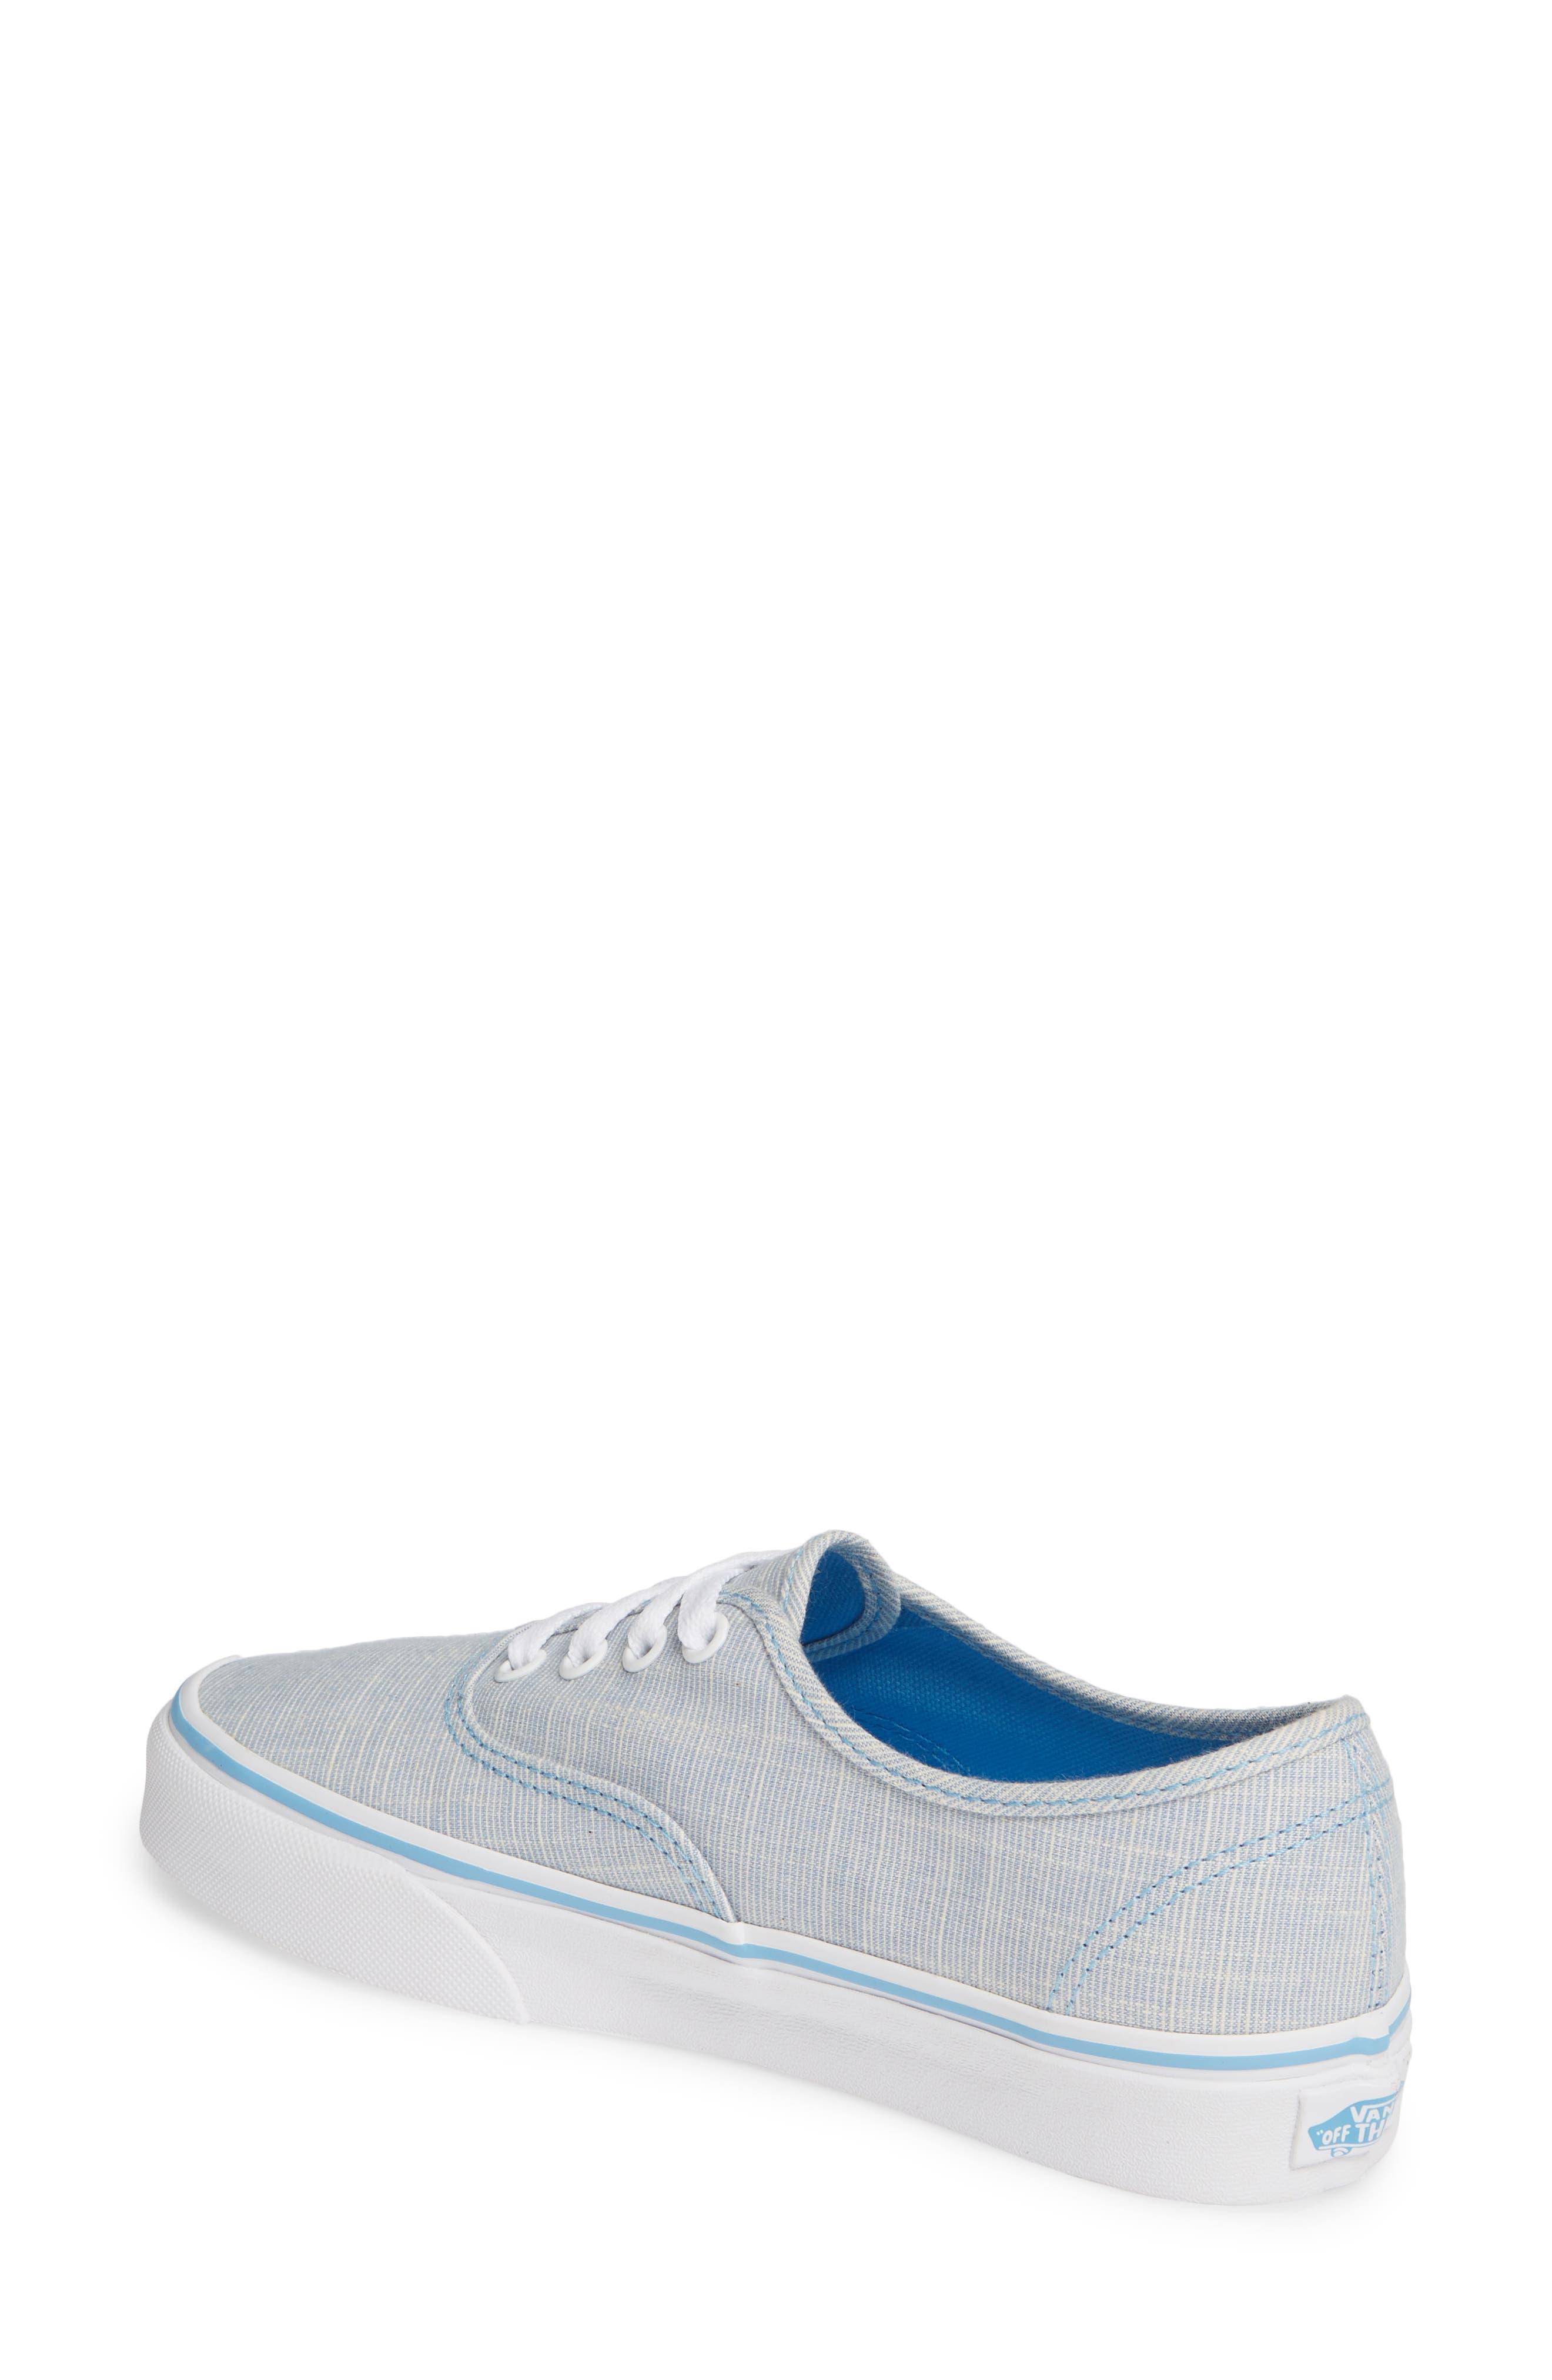 ,                             'Authentic' Sneaker,                             Alternate thumbnail 157, color,                             025